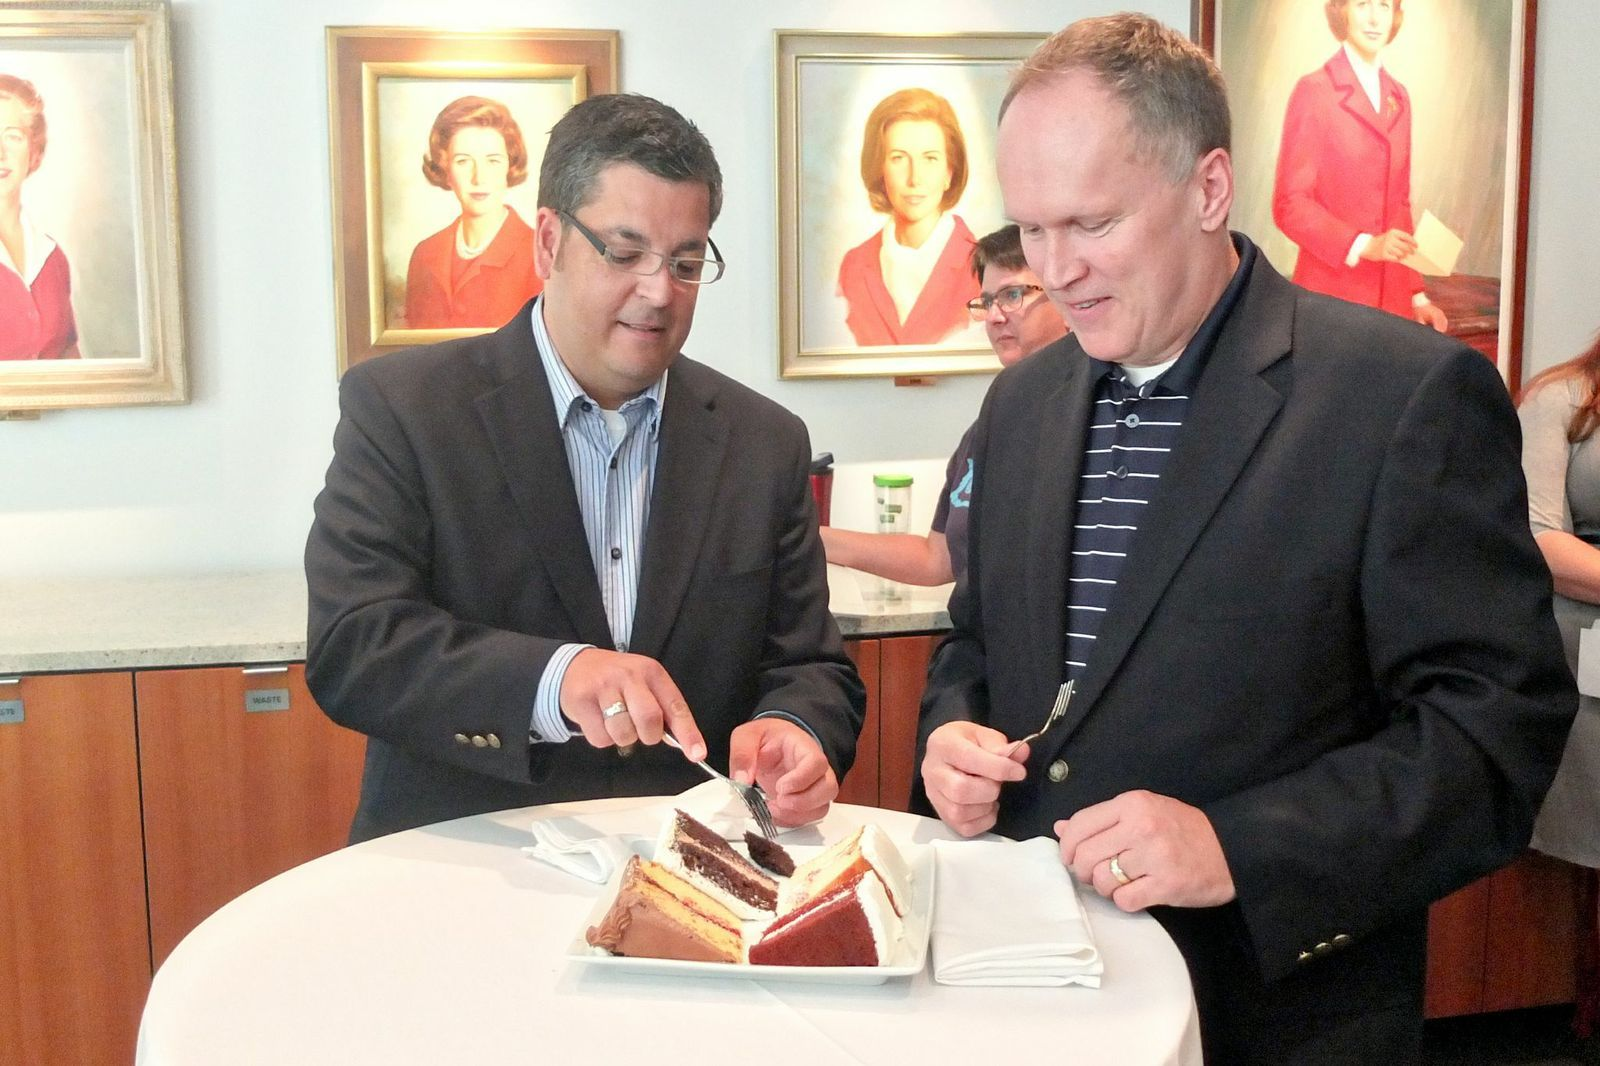 betty crocker cakes gay marriage